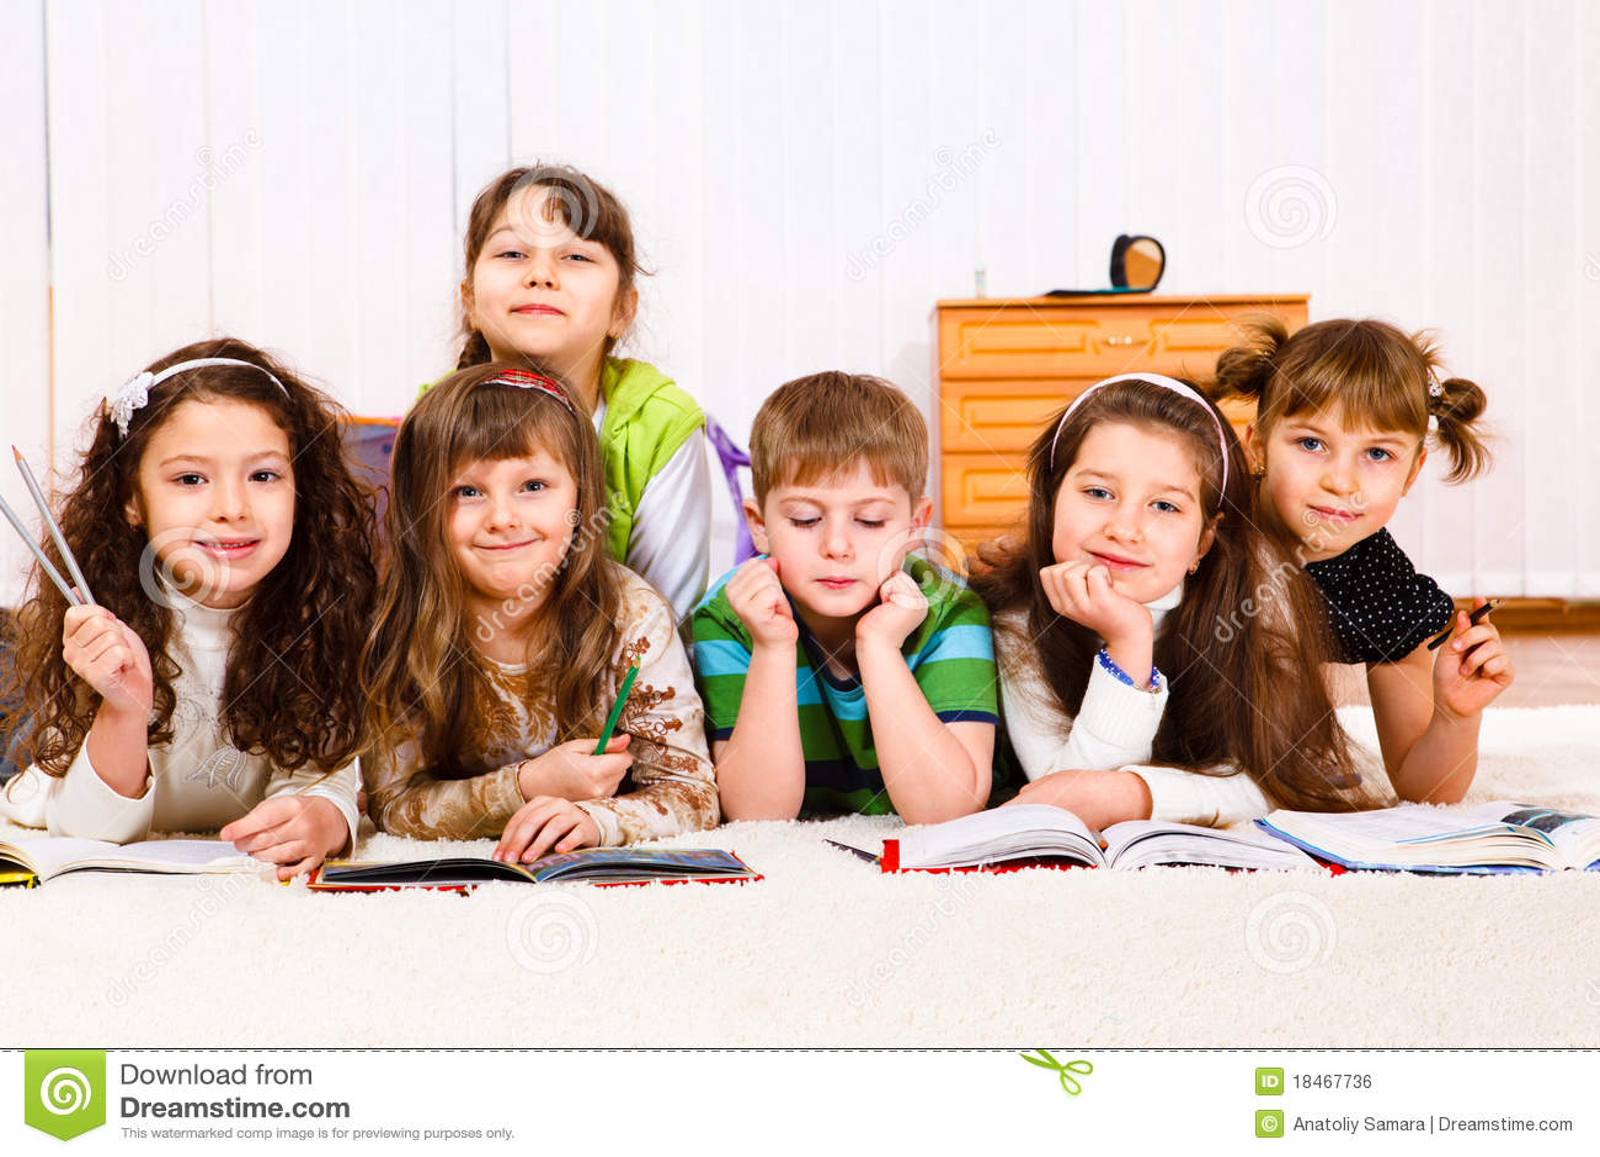 kids reading books royalty free stock image image 18467736